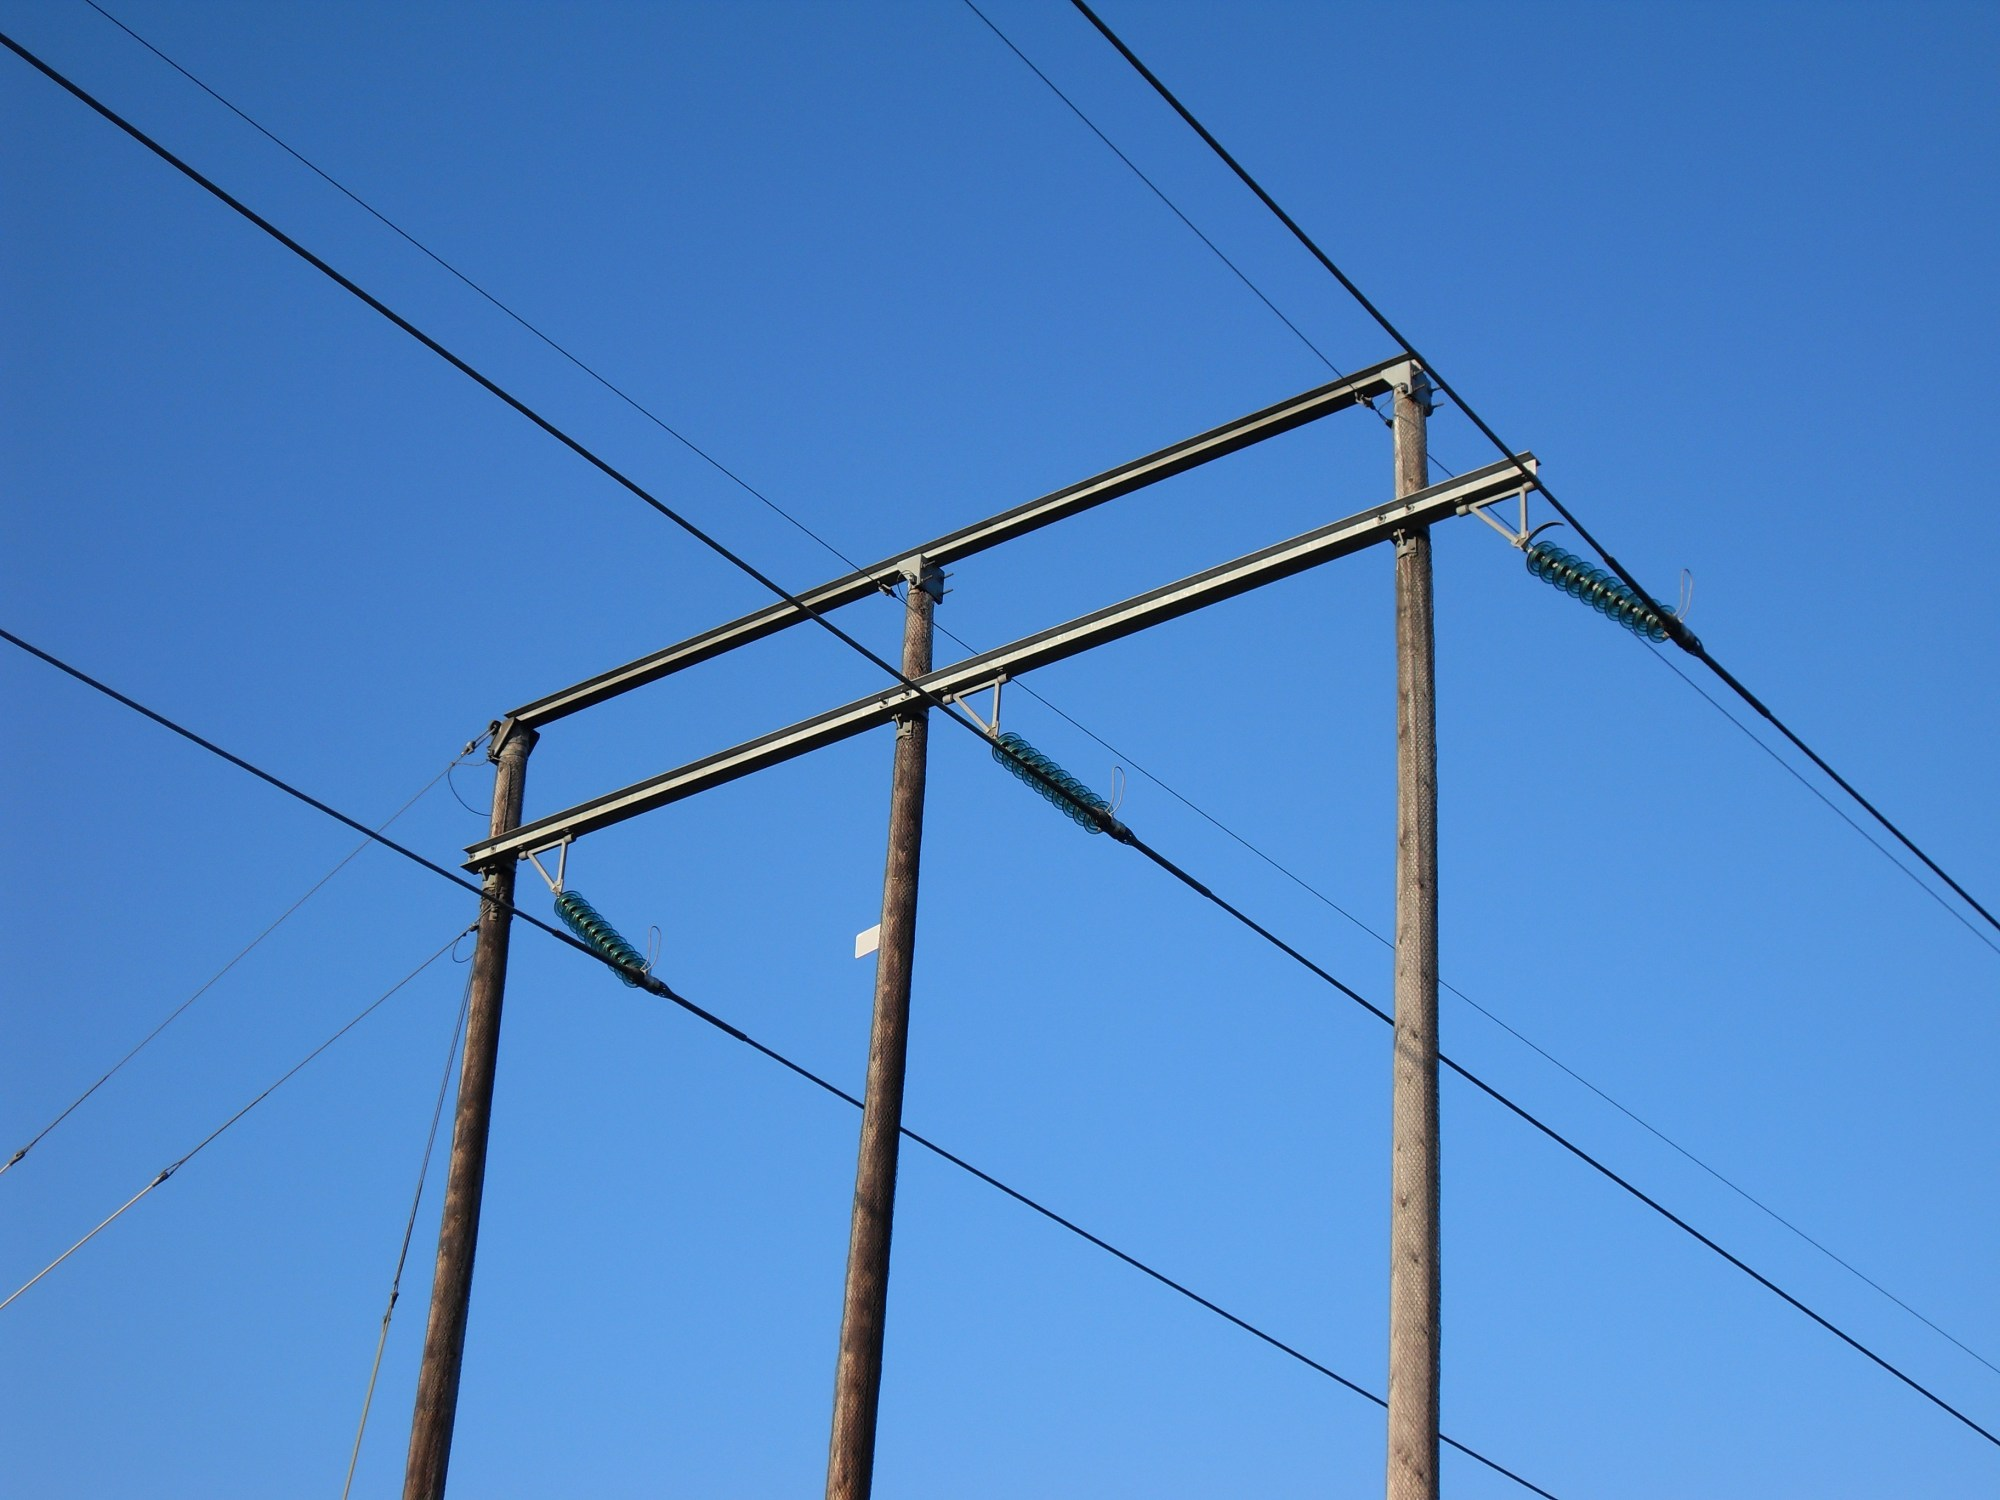 hight resolution of file electric power transmission ljusdal jpg